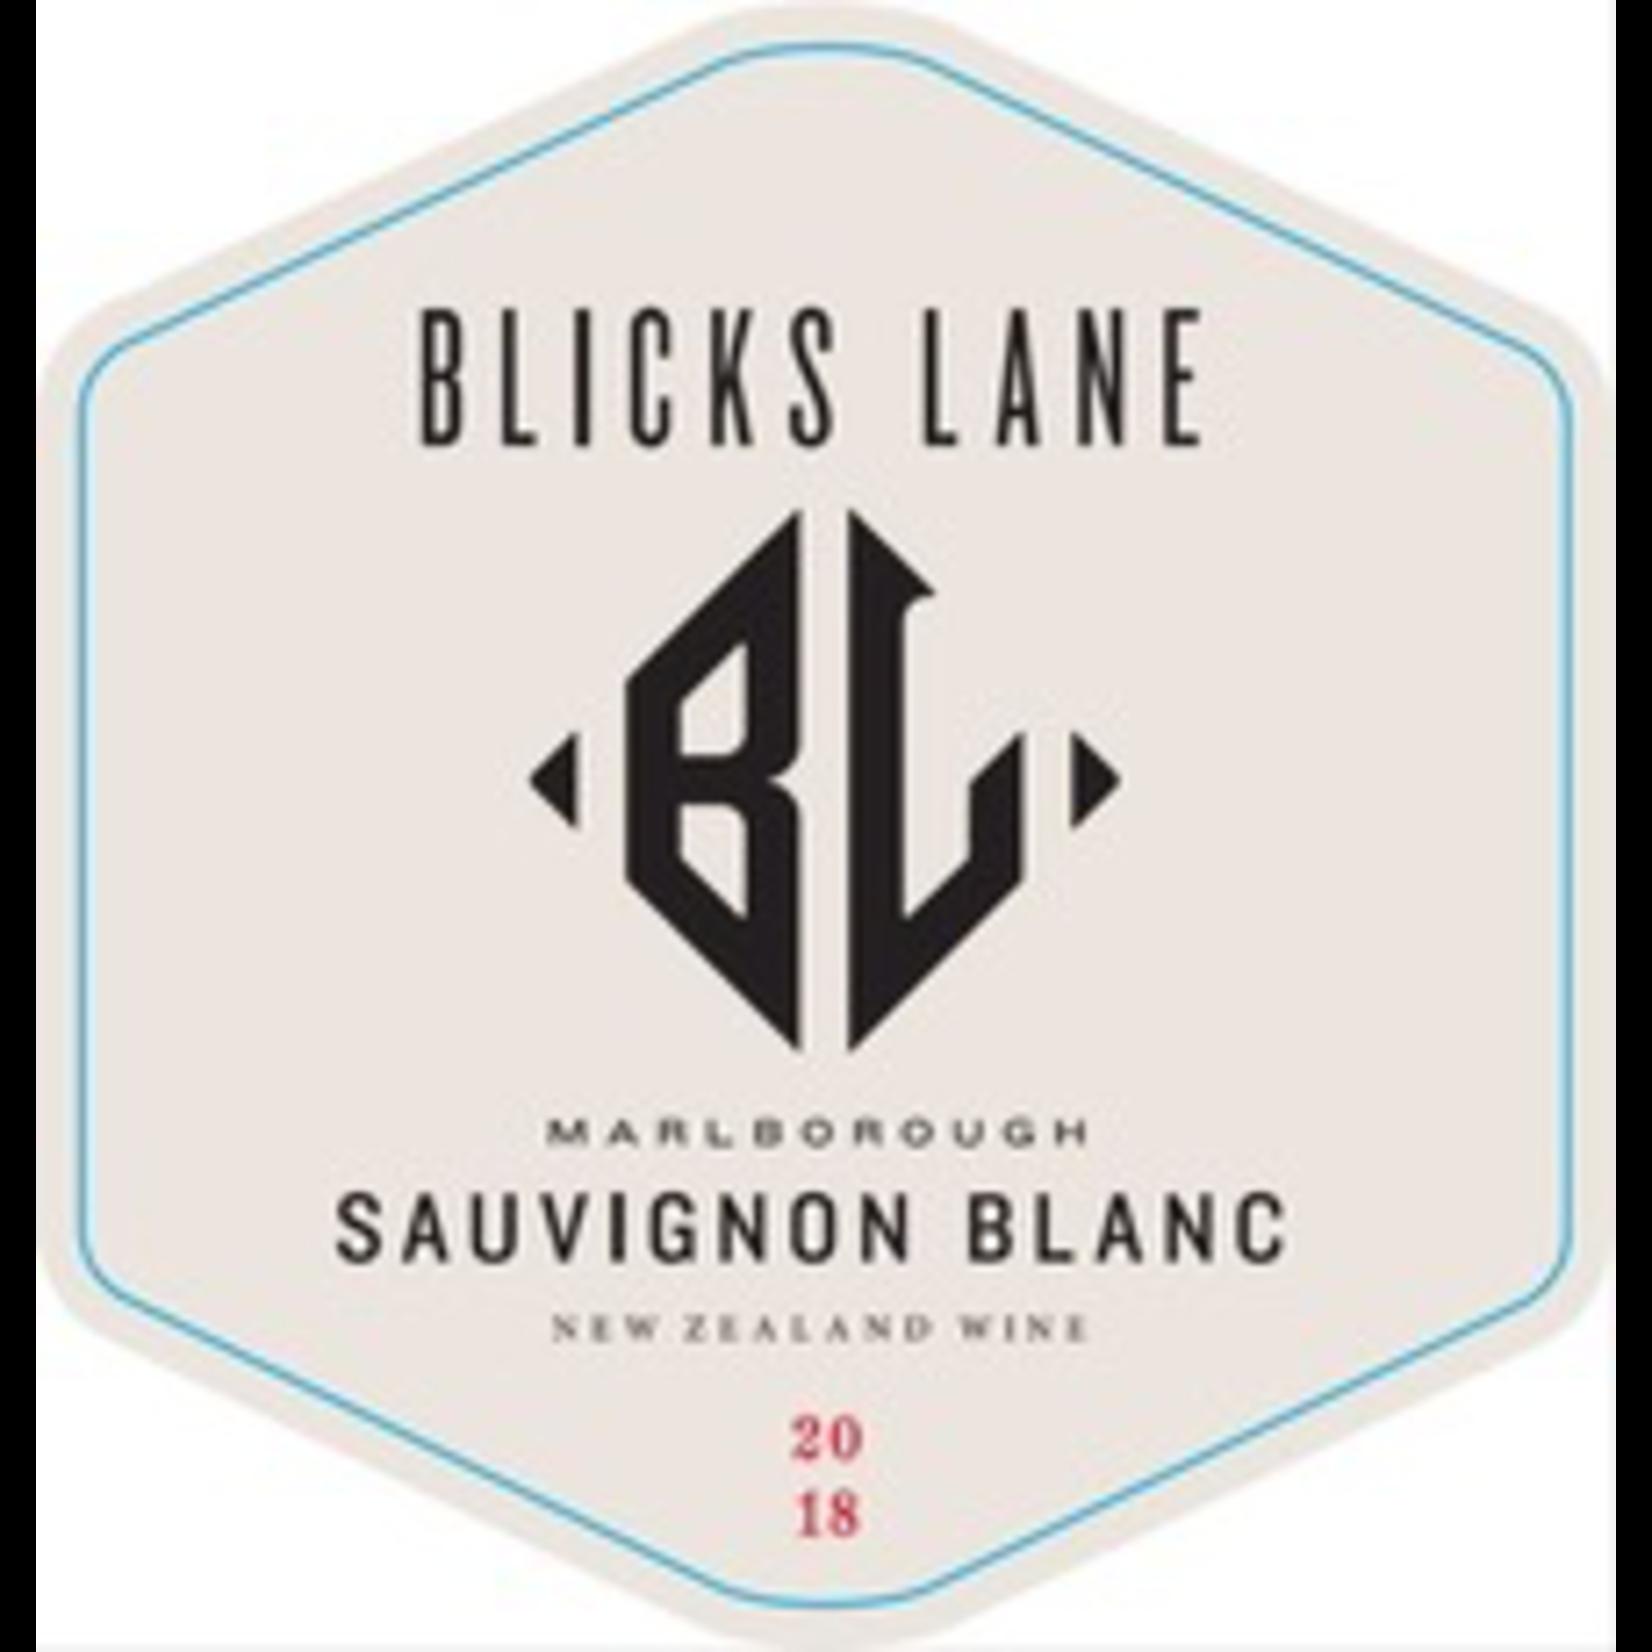 Wine Blicks Lane Vineyards Sauvignon Blanc Marlborough 2020